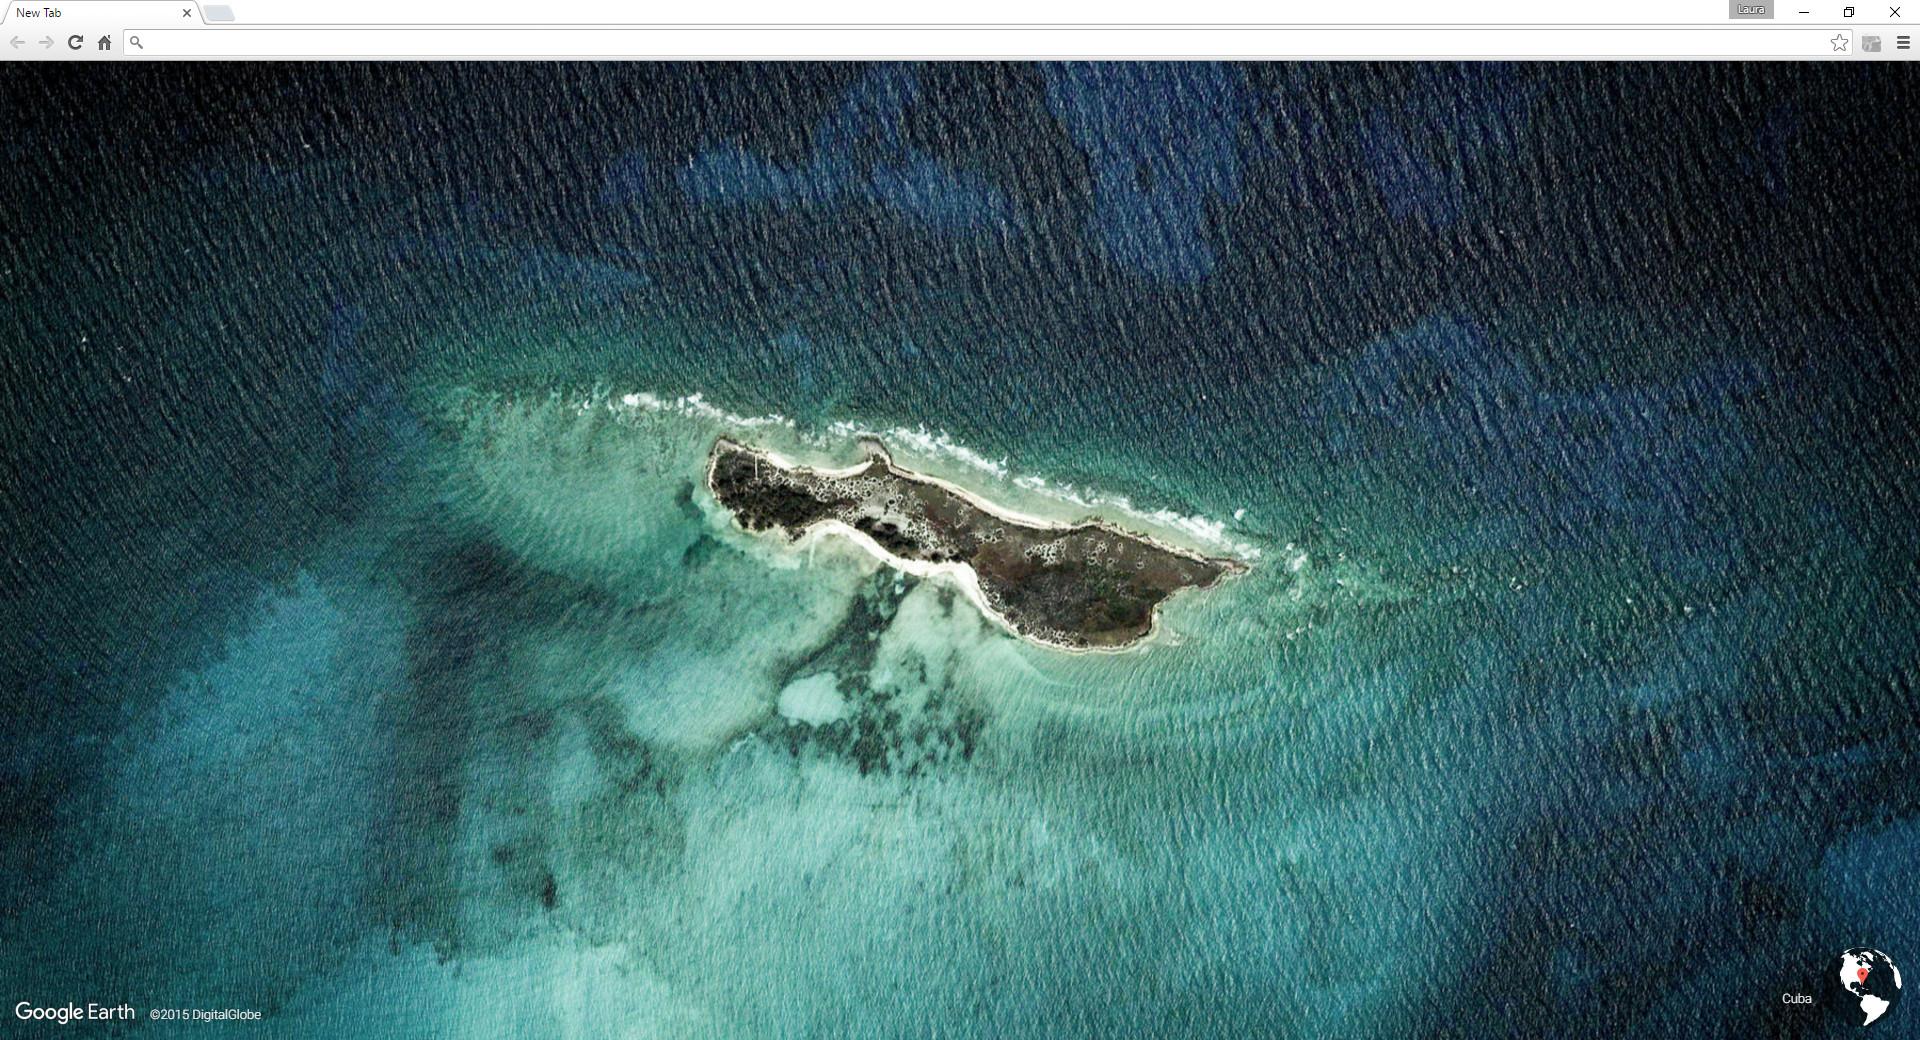 Screenshot 1 - Earth View from Google Maps für Chrome